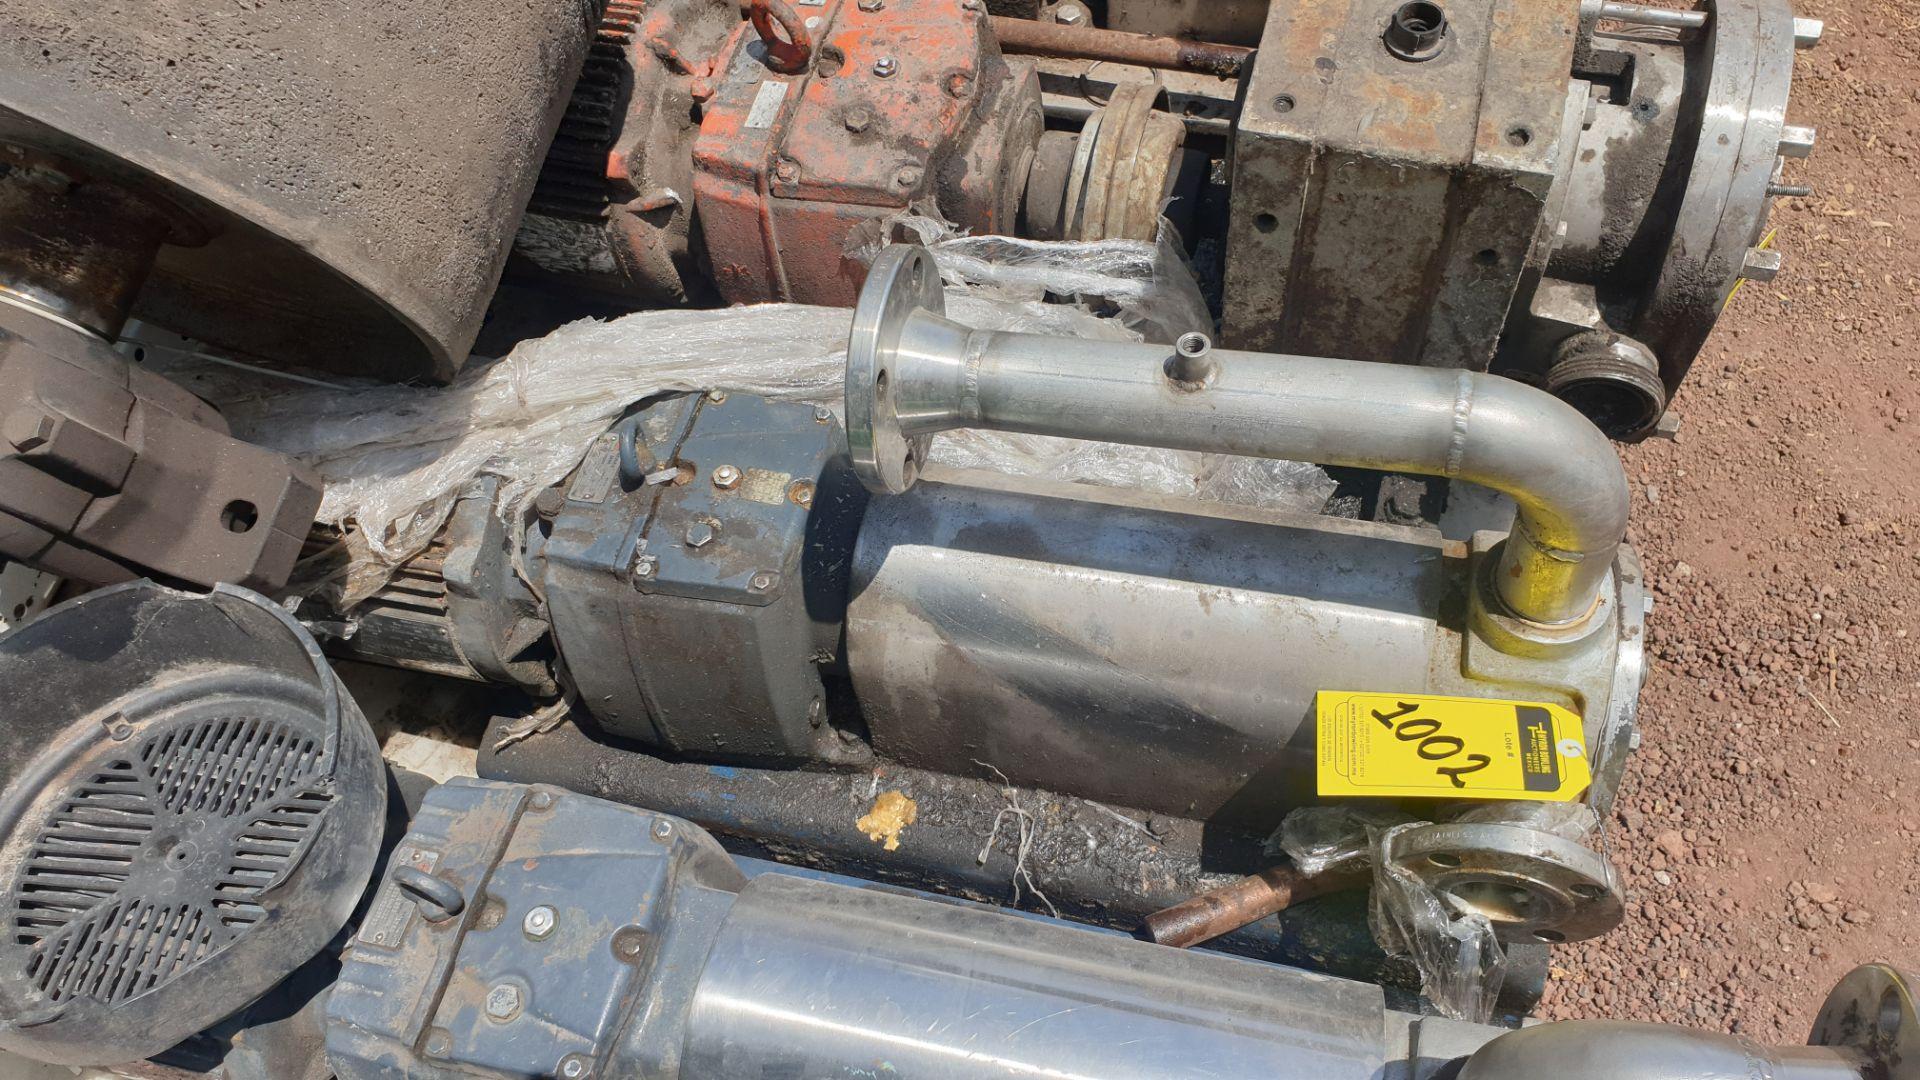 Pneumatic pump, includes emerson motor, model 684982 capacity 10Hp 230v - 460v - Image 6 of 8